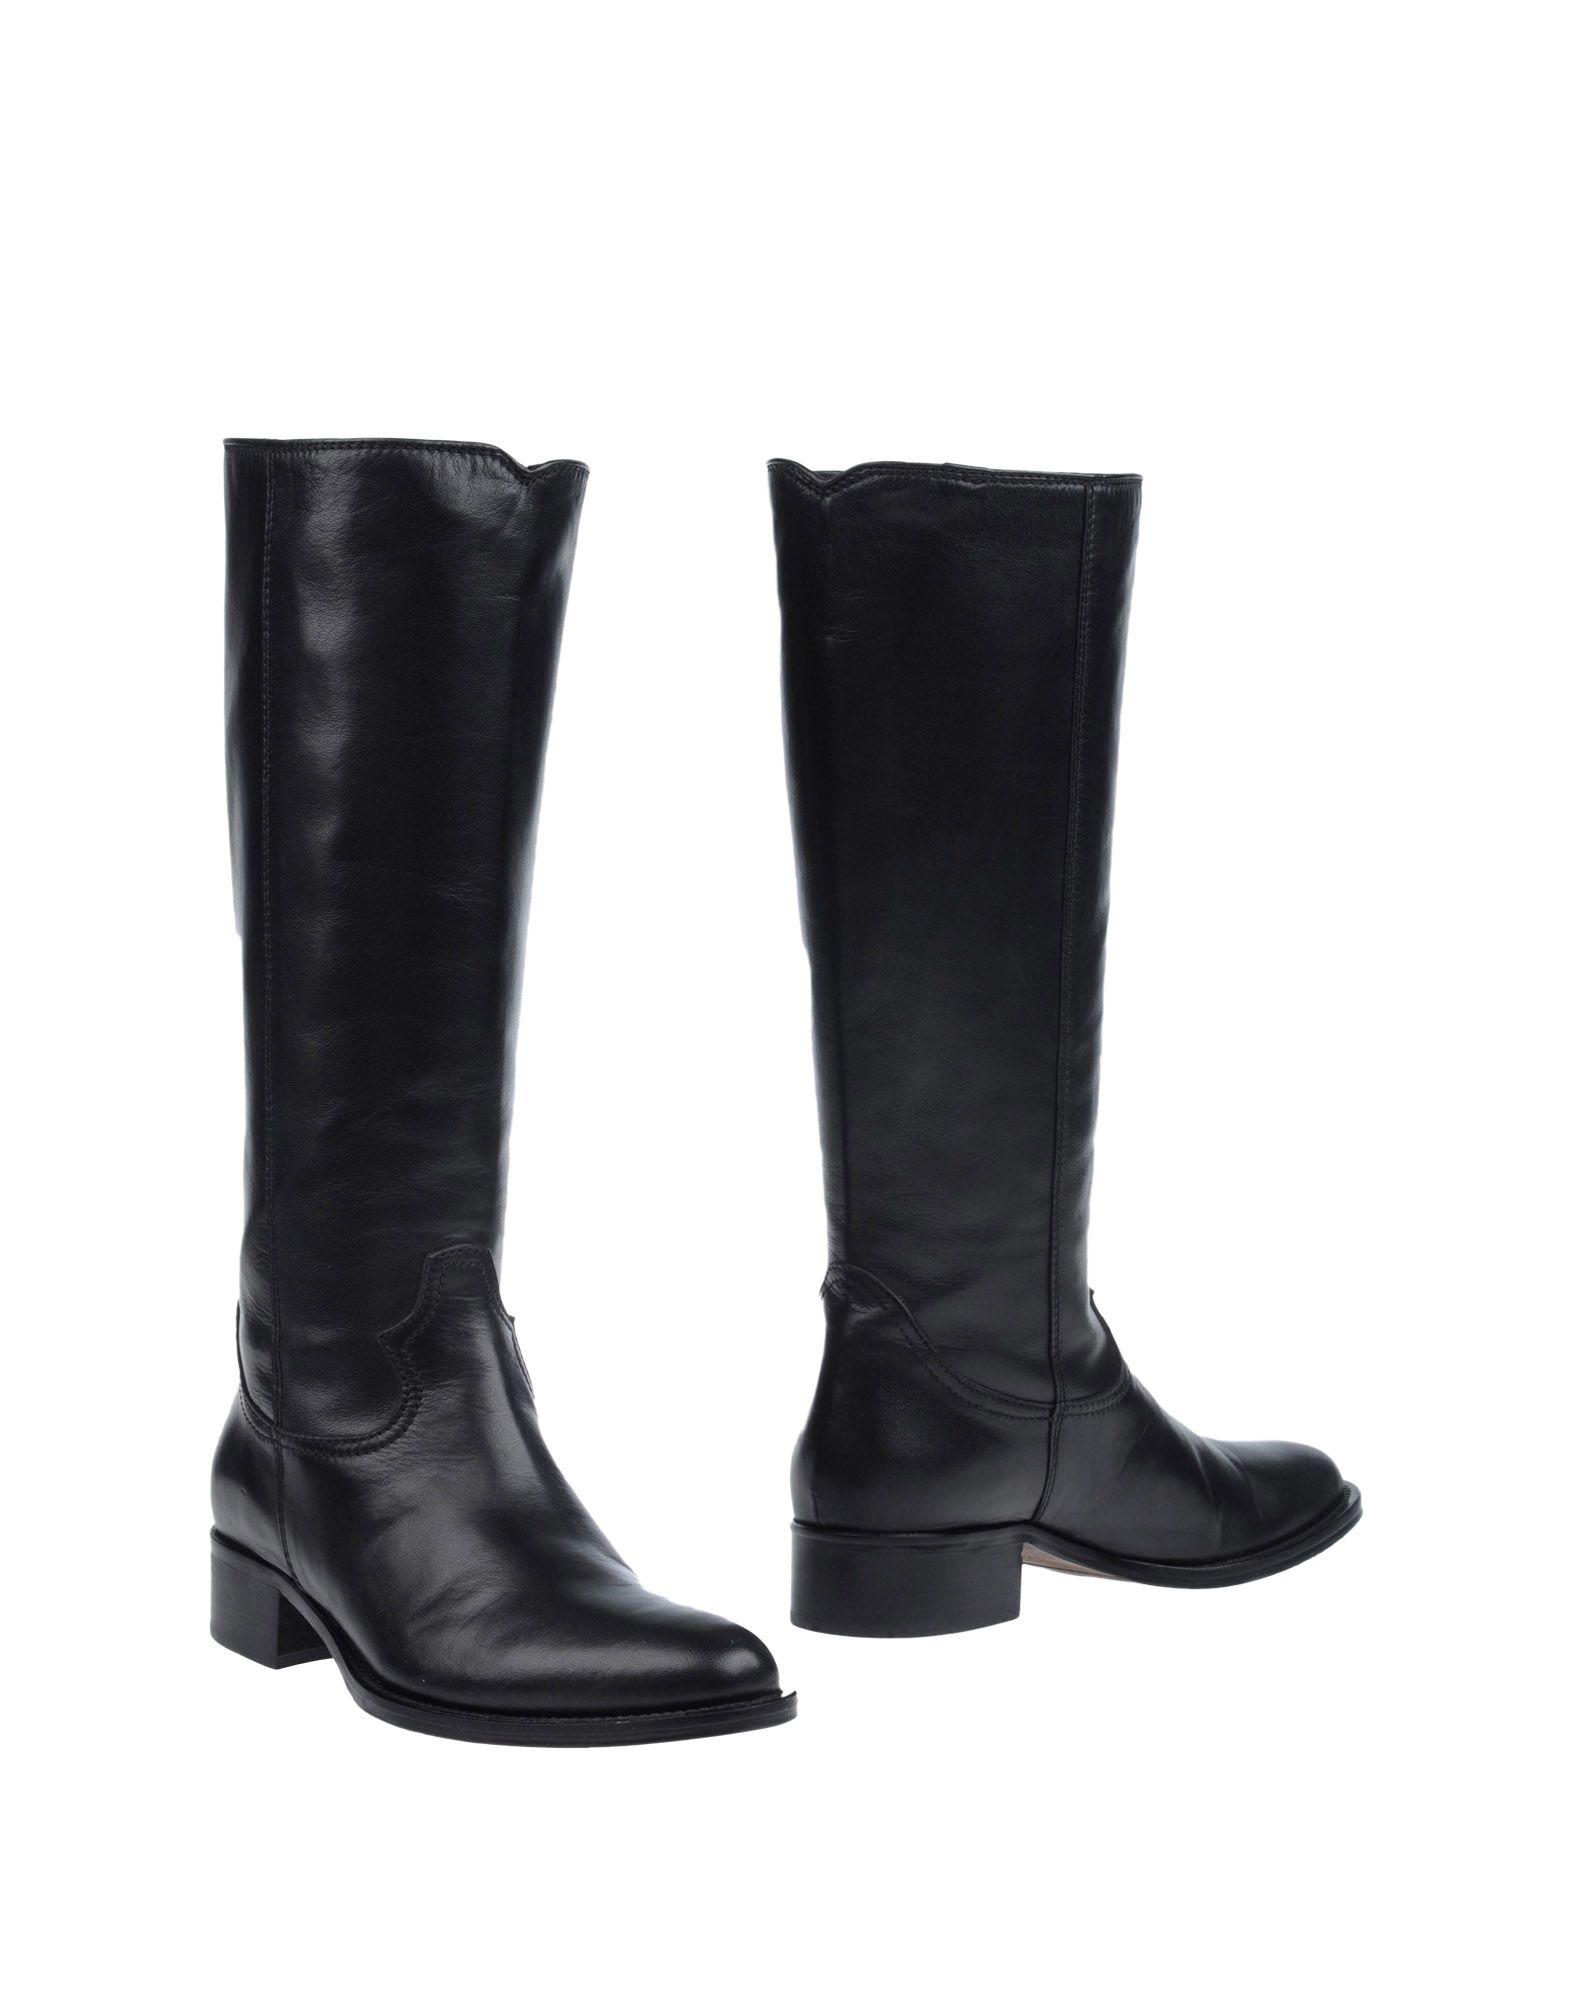 Maria 11248136BIGut Cristina Stiefel Damen  11248136BIGut Maria aussehende strapazierfähige Schuhe 97eb89